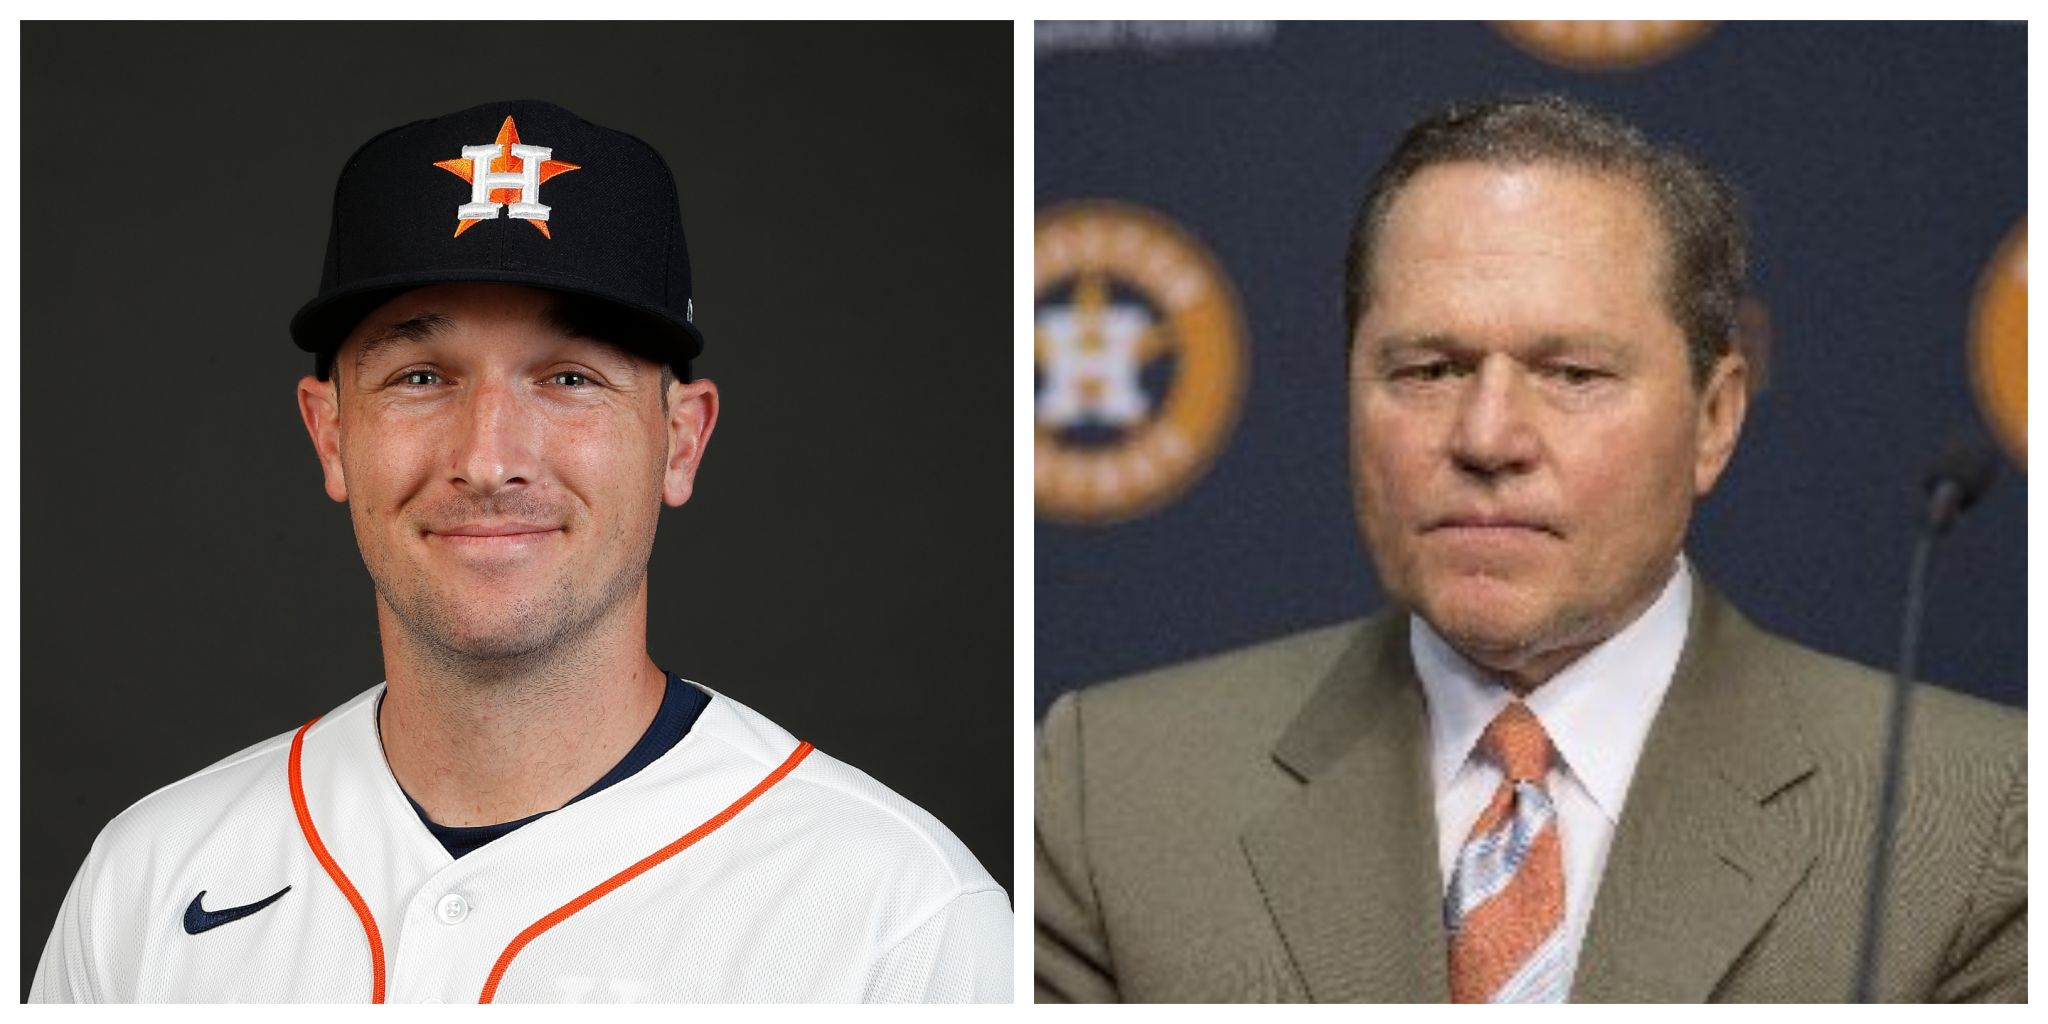 Astros' Alex Bregman hires Scott Boras as agent